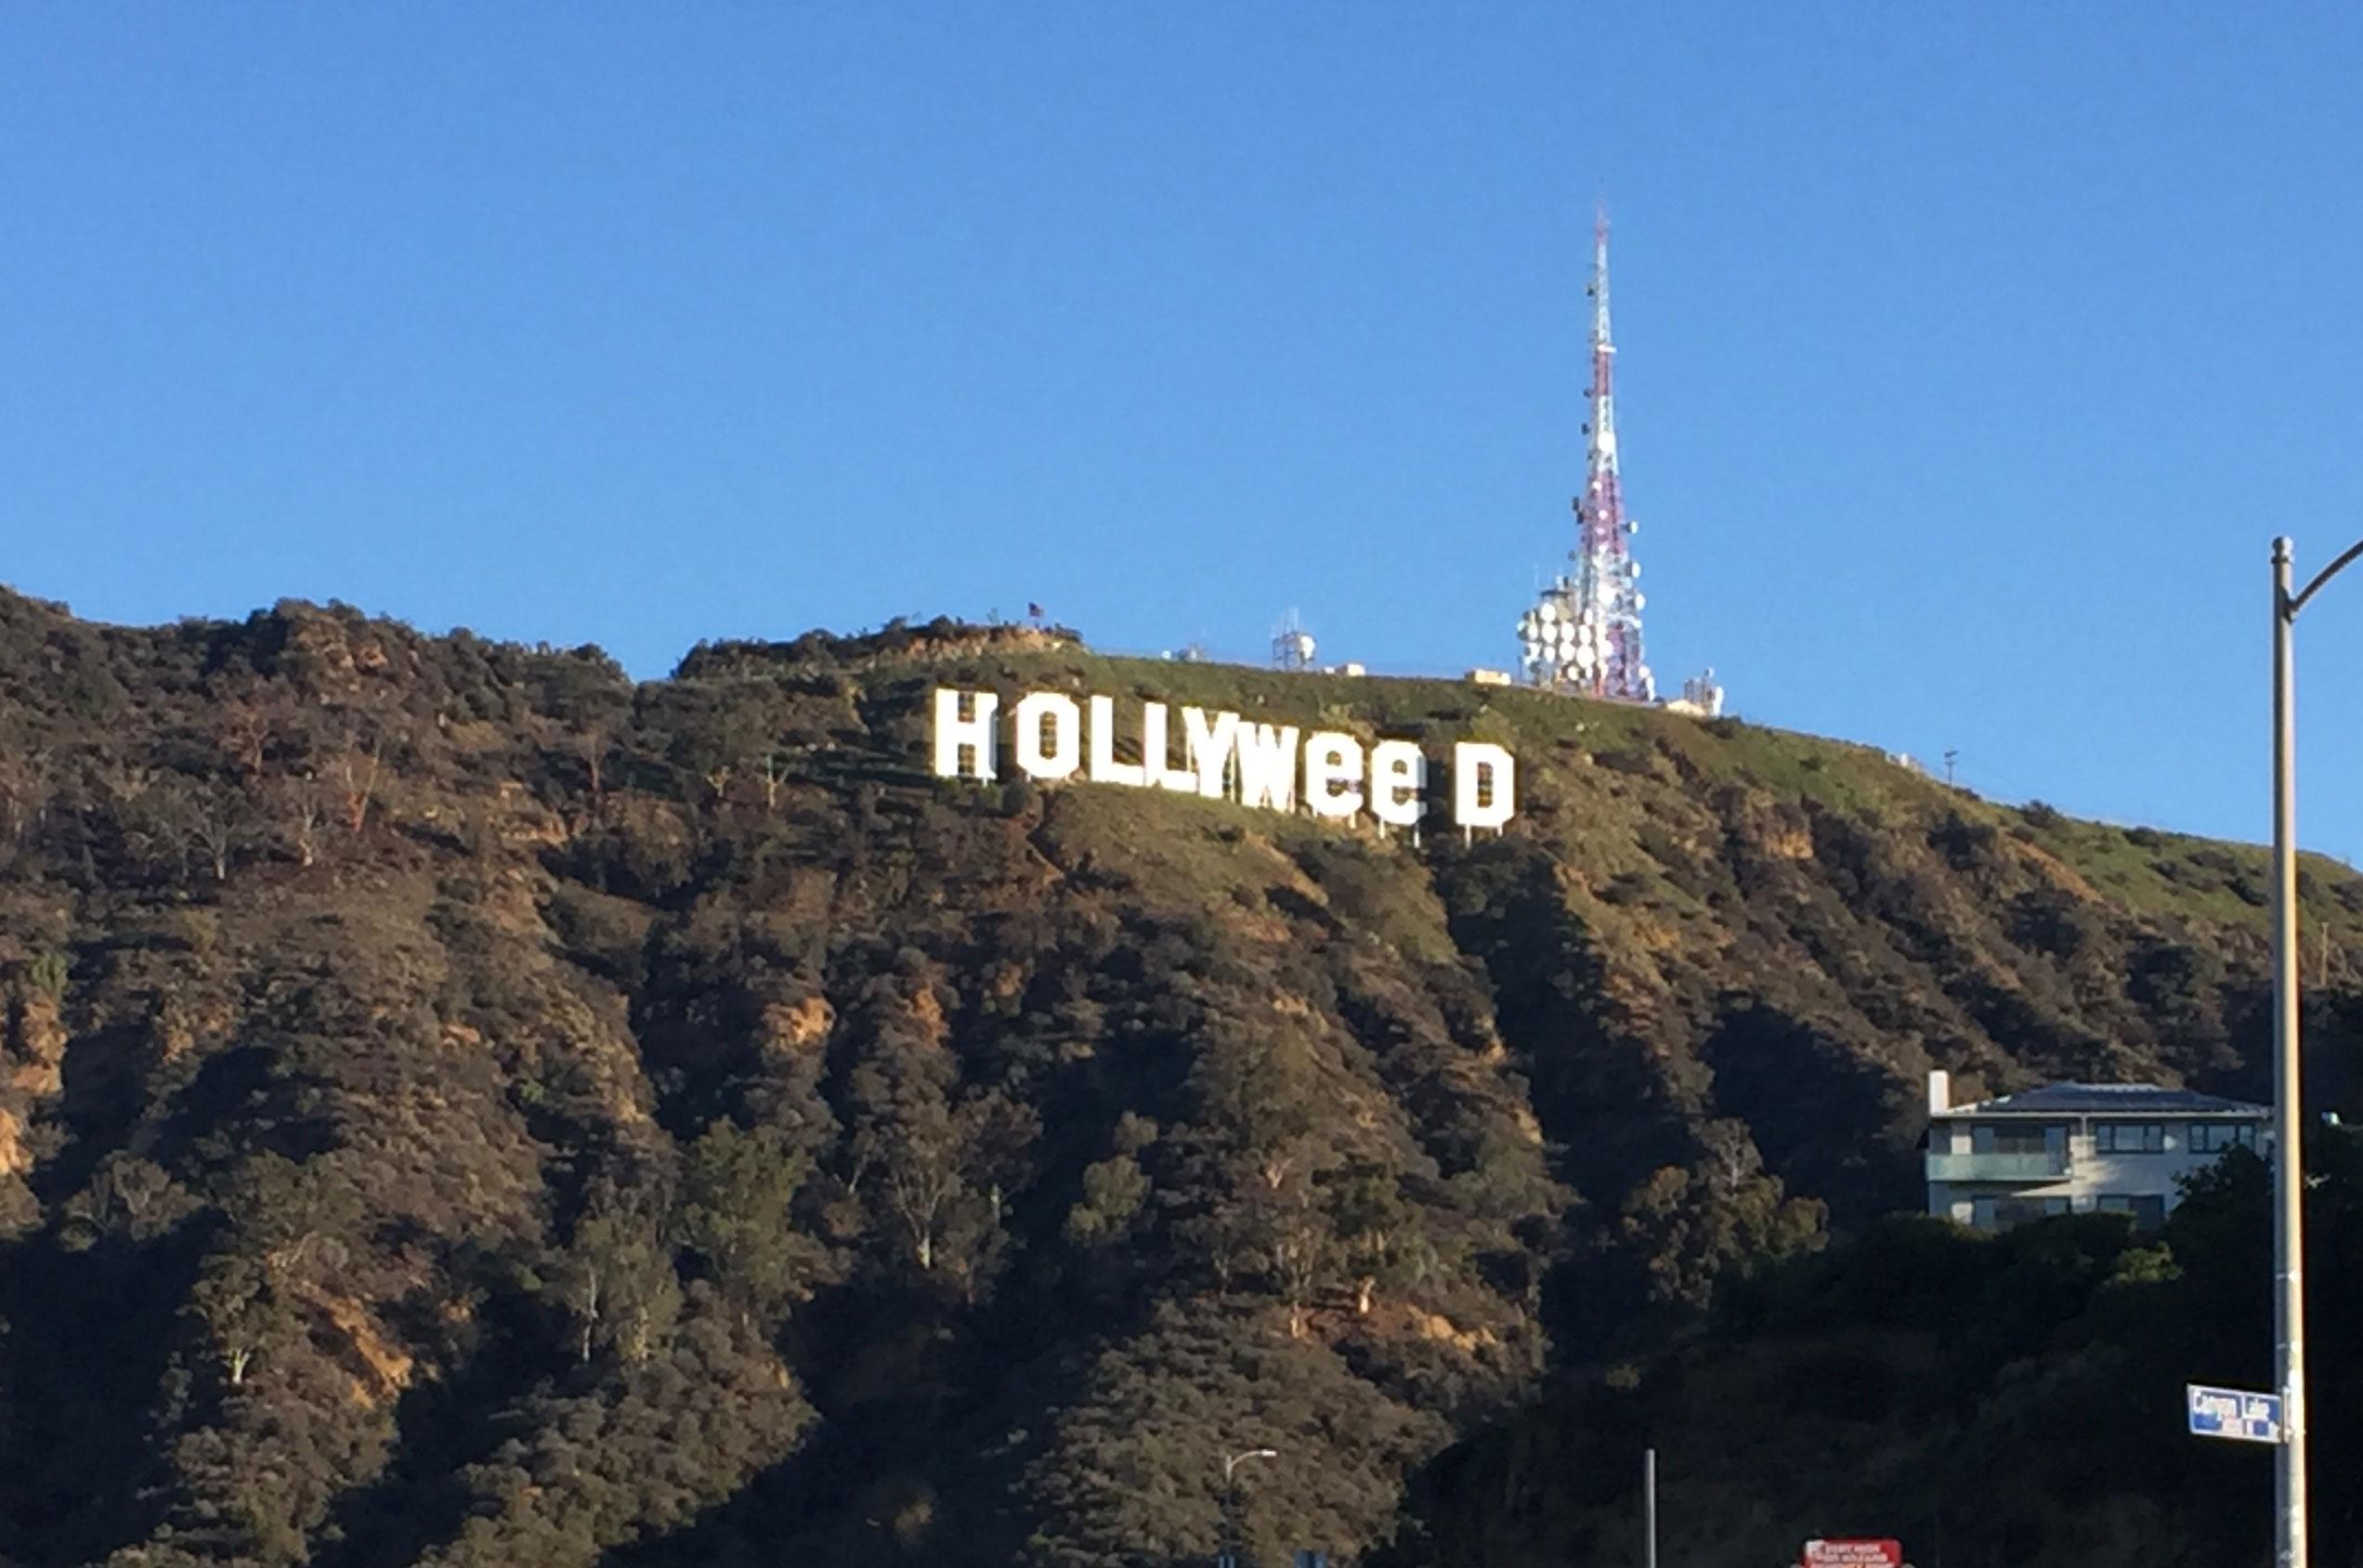 Angelenos woke up to surprise on the Hollywood Hills on Sunday, Jan. 1, 2017.